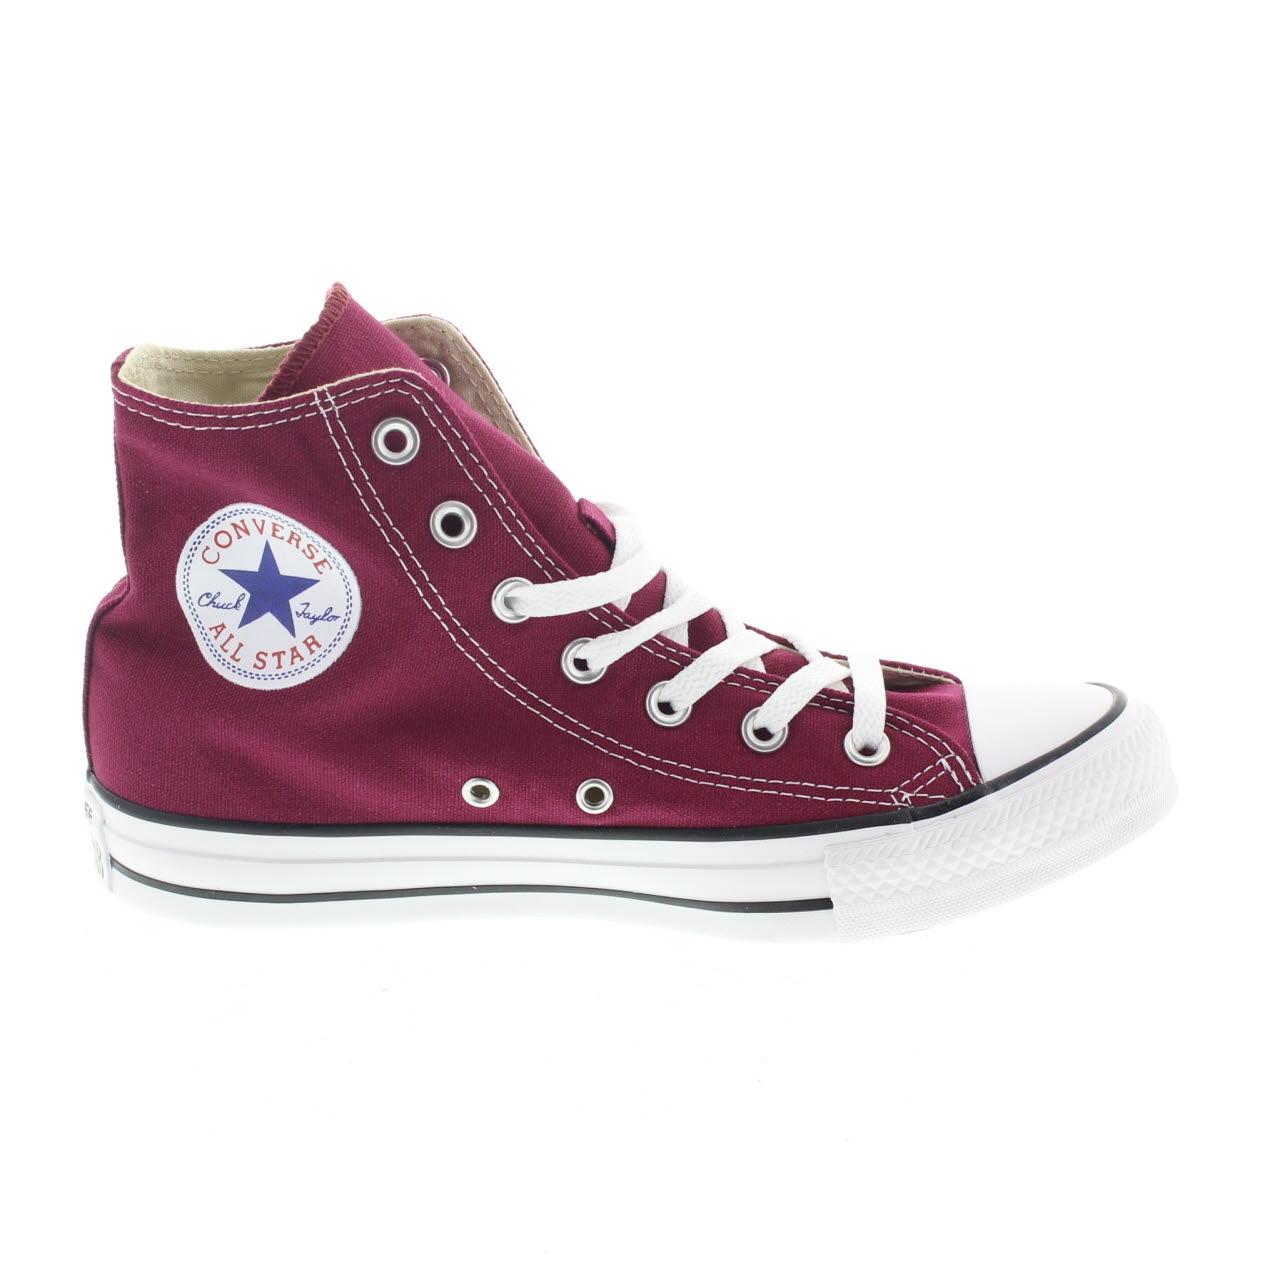 scarpe unisex CONVERSE CHUCK TAYLOR ALL STAR BORDEAUX